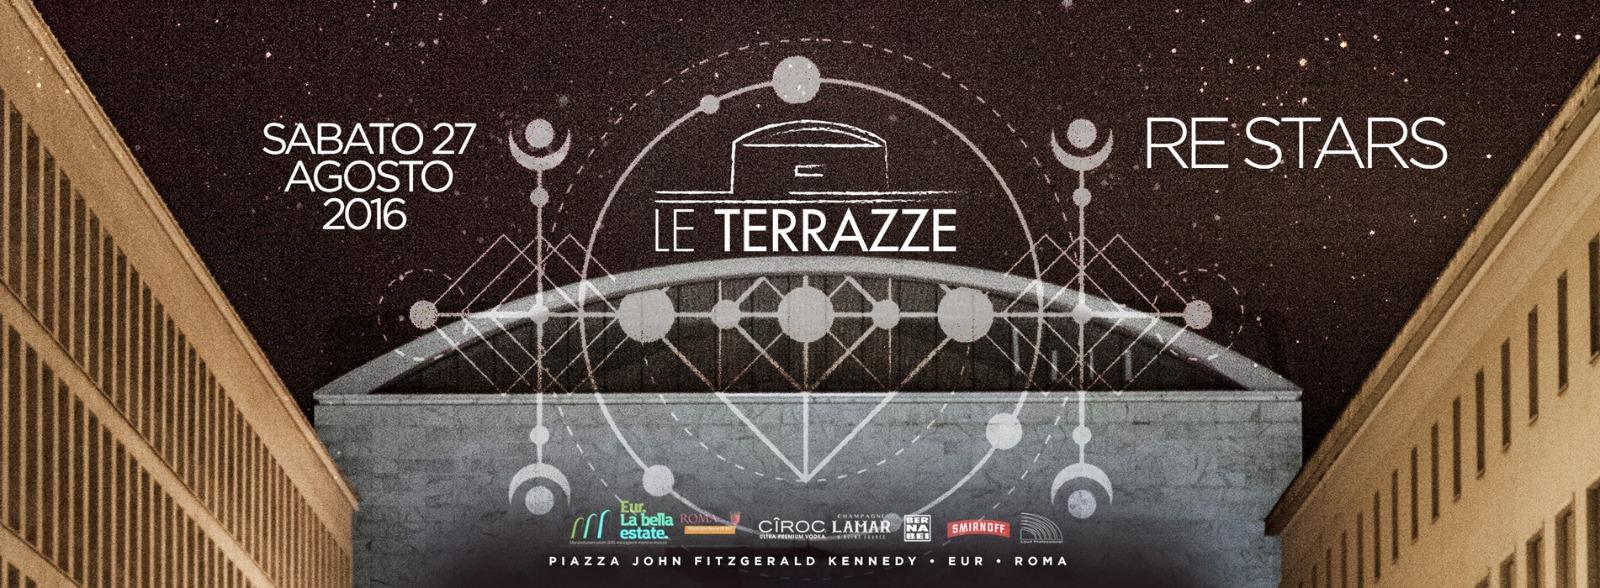 Discoteca Le Terrazze Roma sabato 27 Agosto 2016